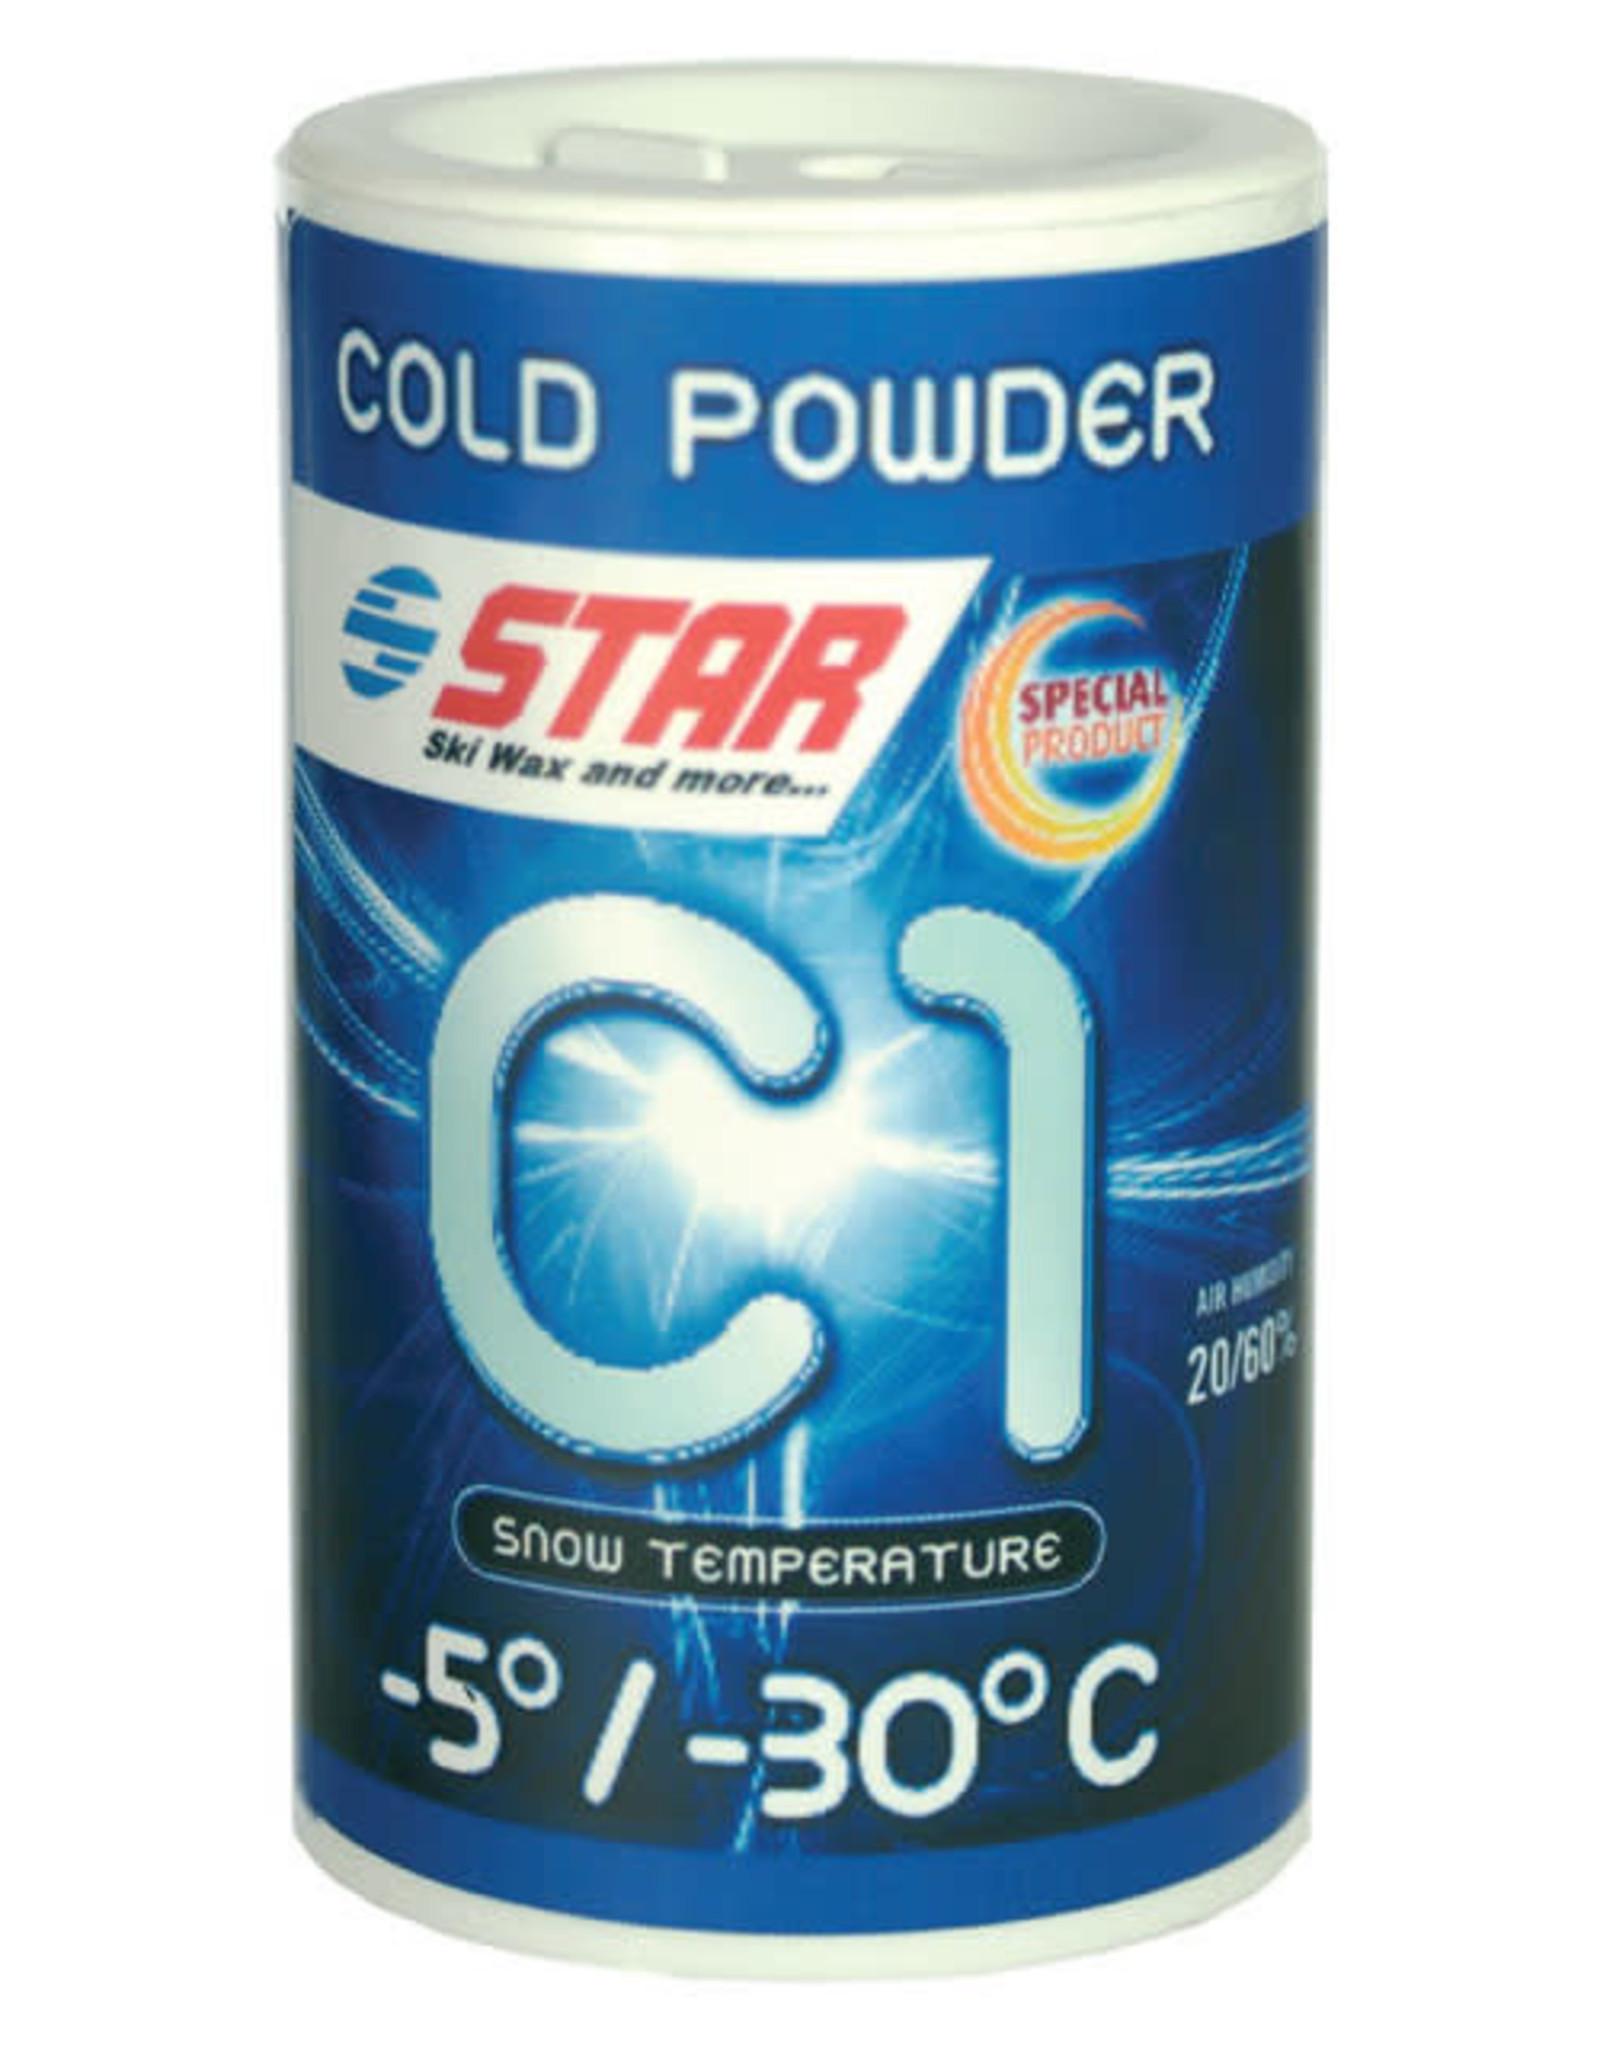 Star Star Glide C1 Cold Powder